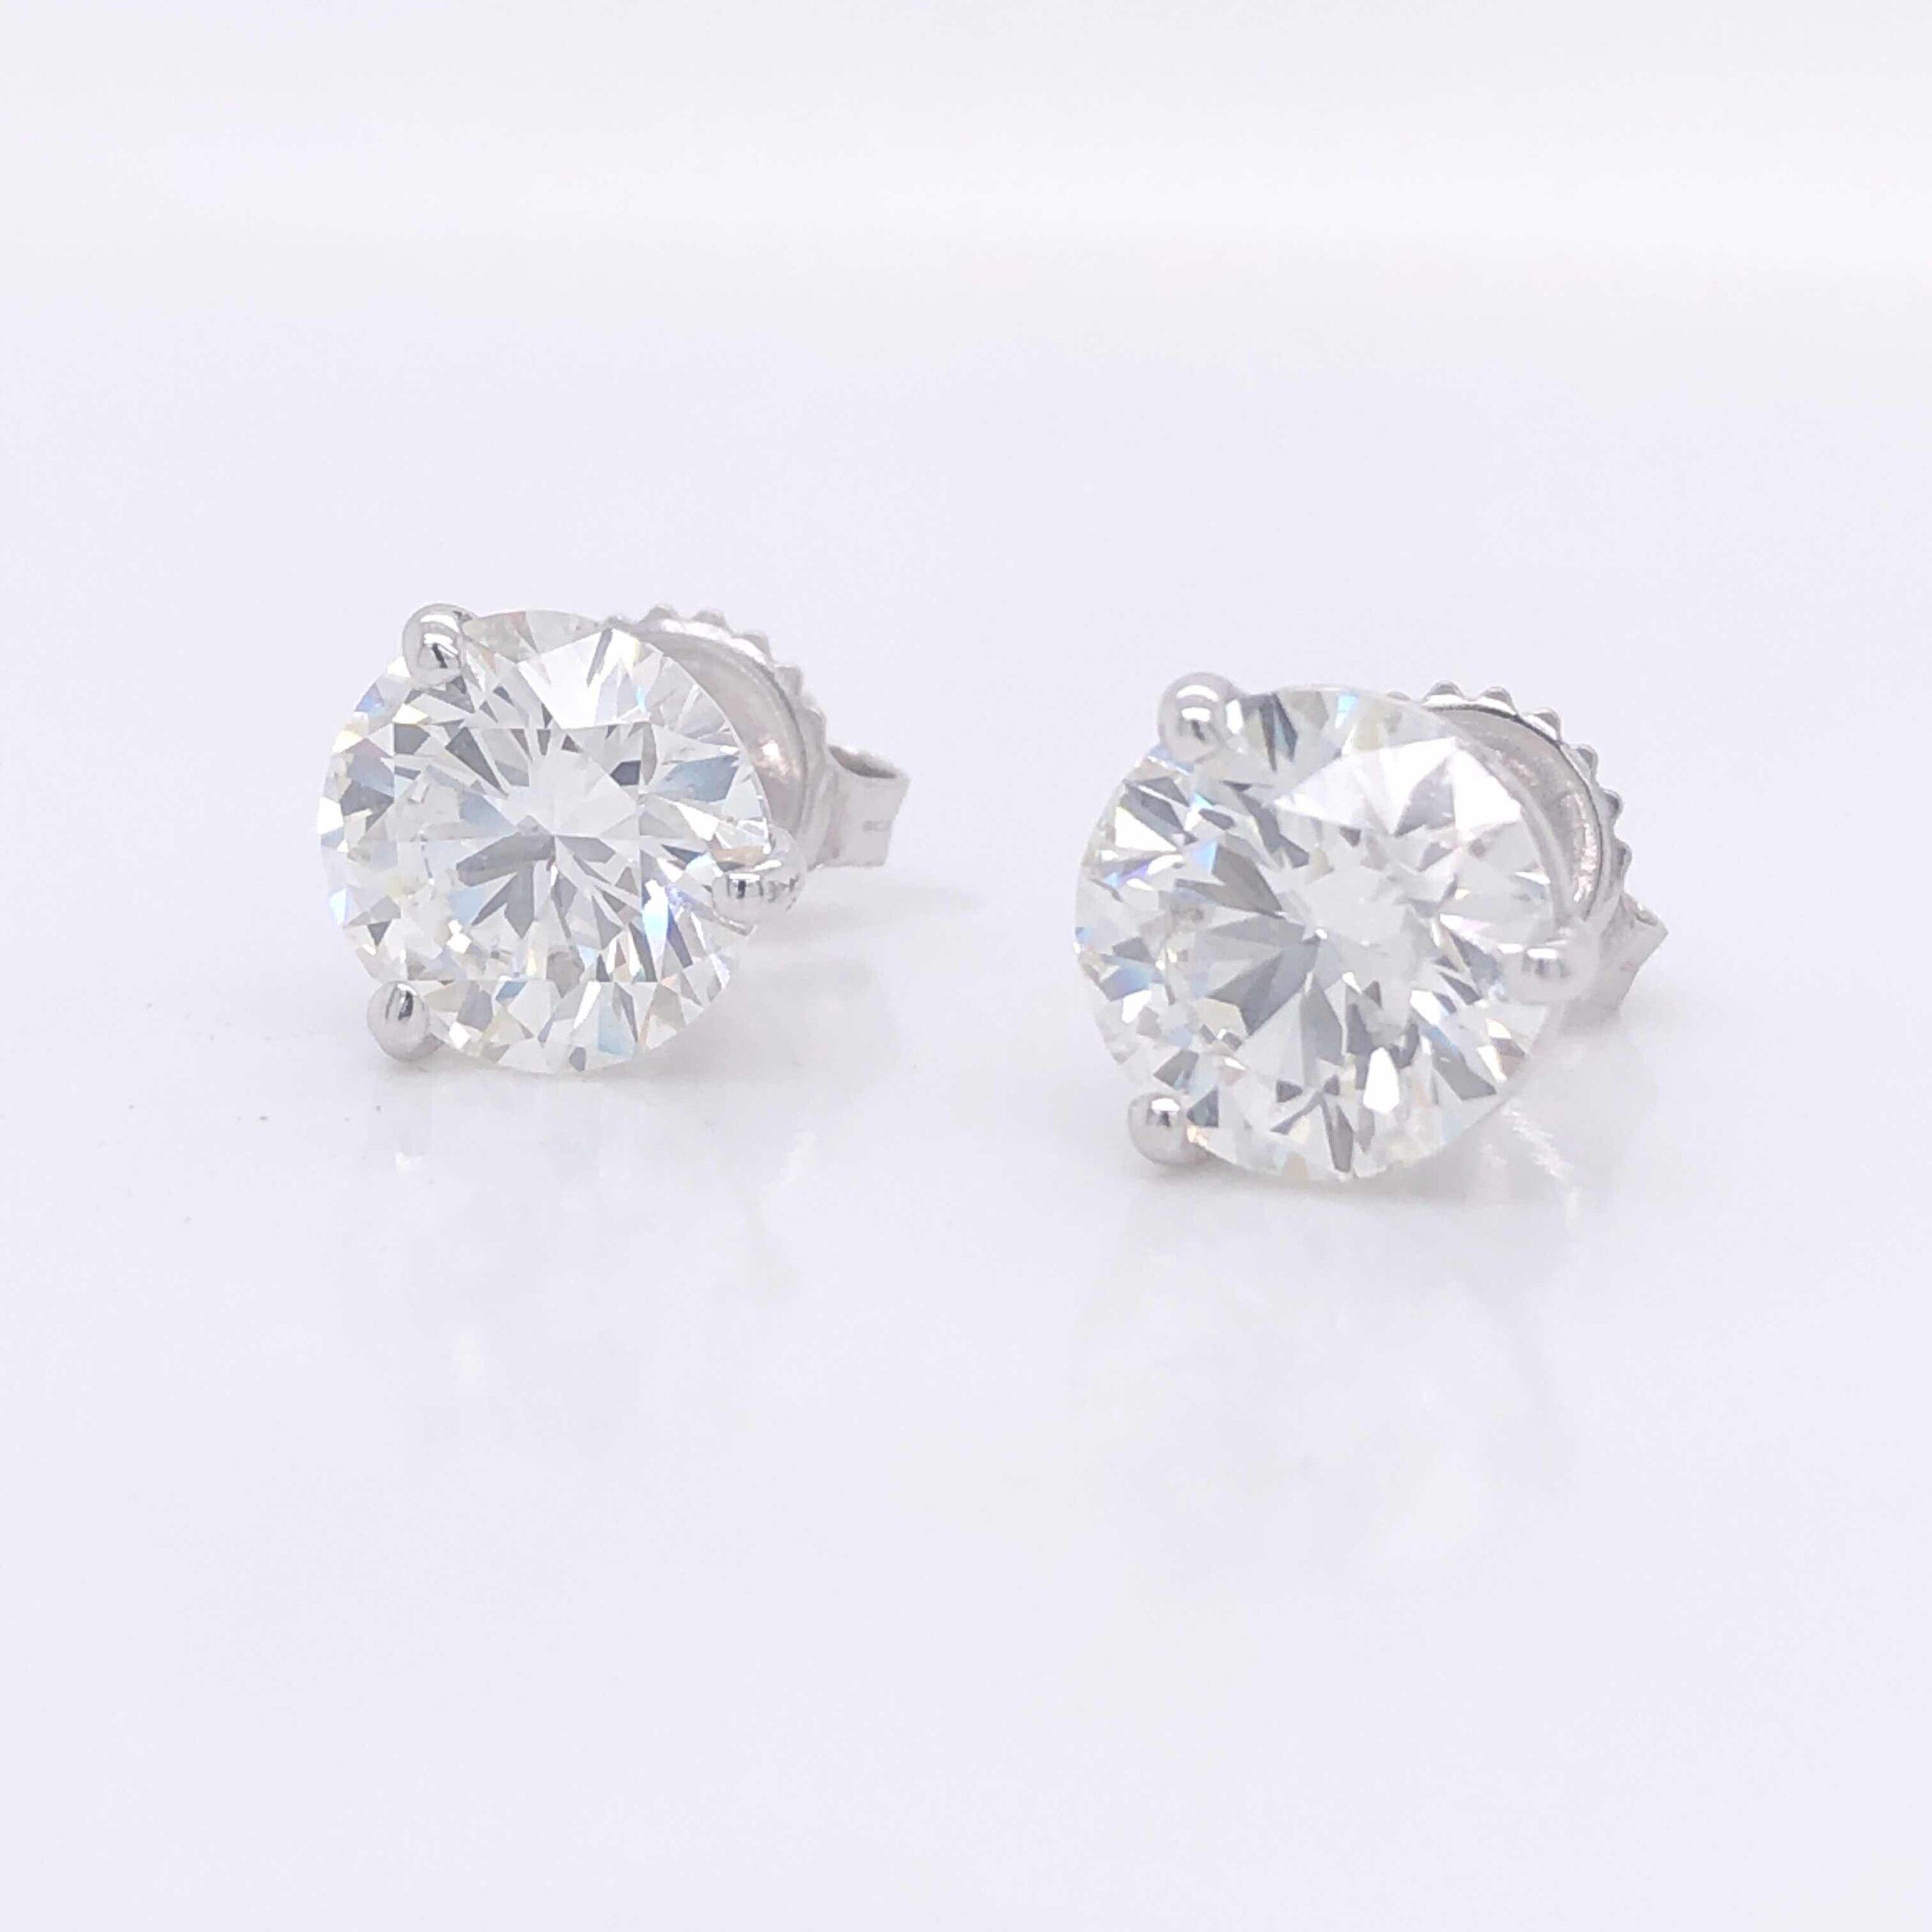 Diamond Buyer Aventura, FL | Diamond Buyer Near Me | Diamond Buyers